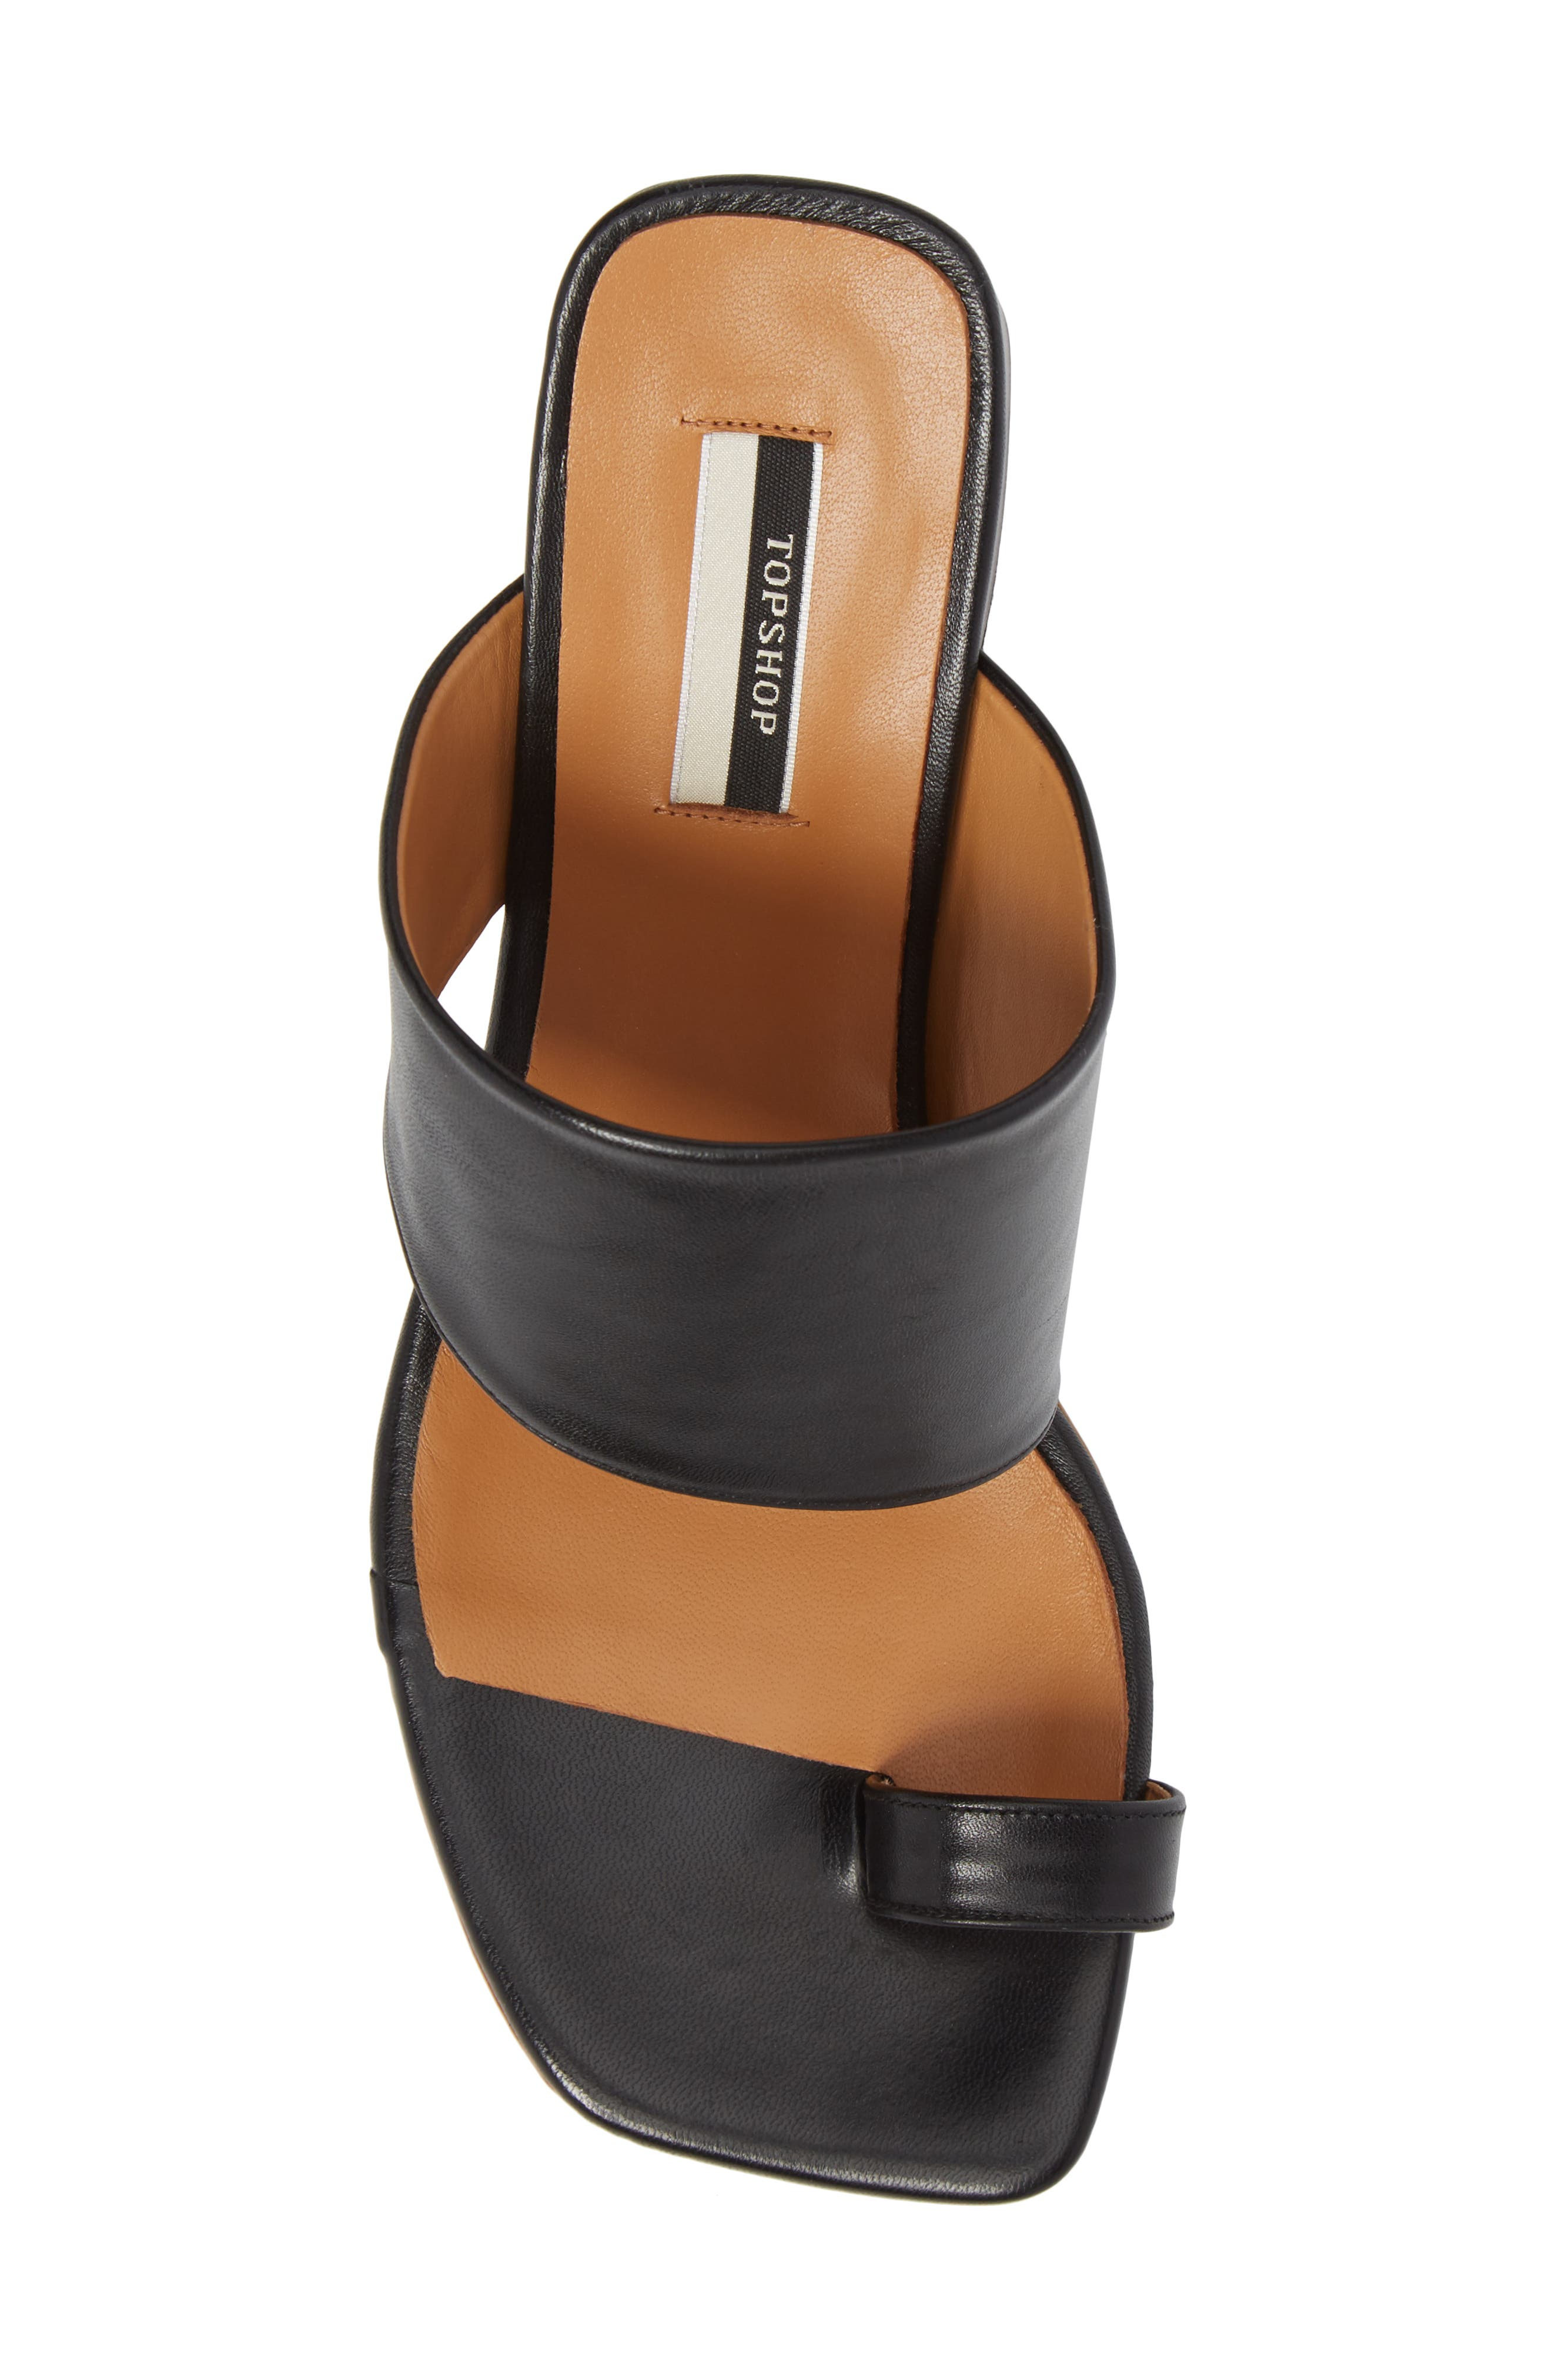 Nimble Toe Loop Slide Sandal,                             Alternate thumbnail 5, color,                             Black